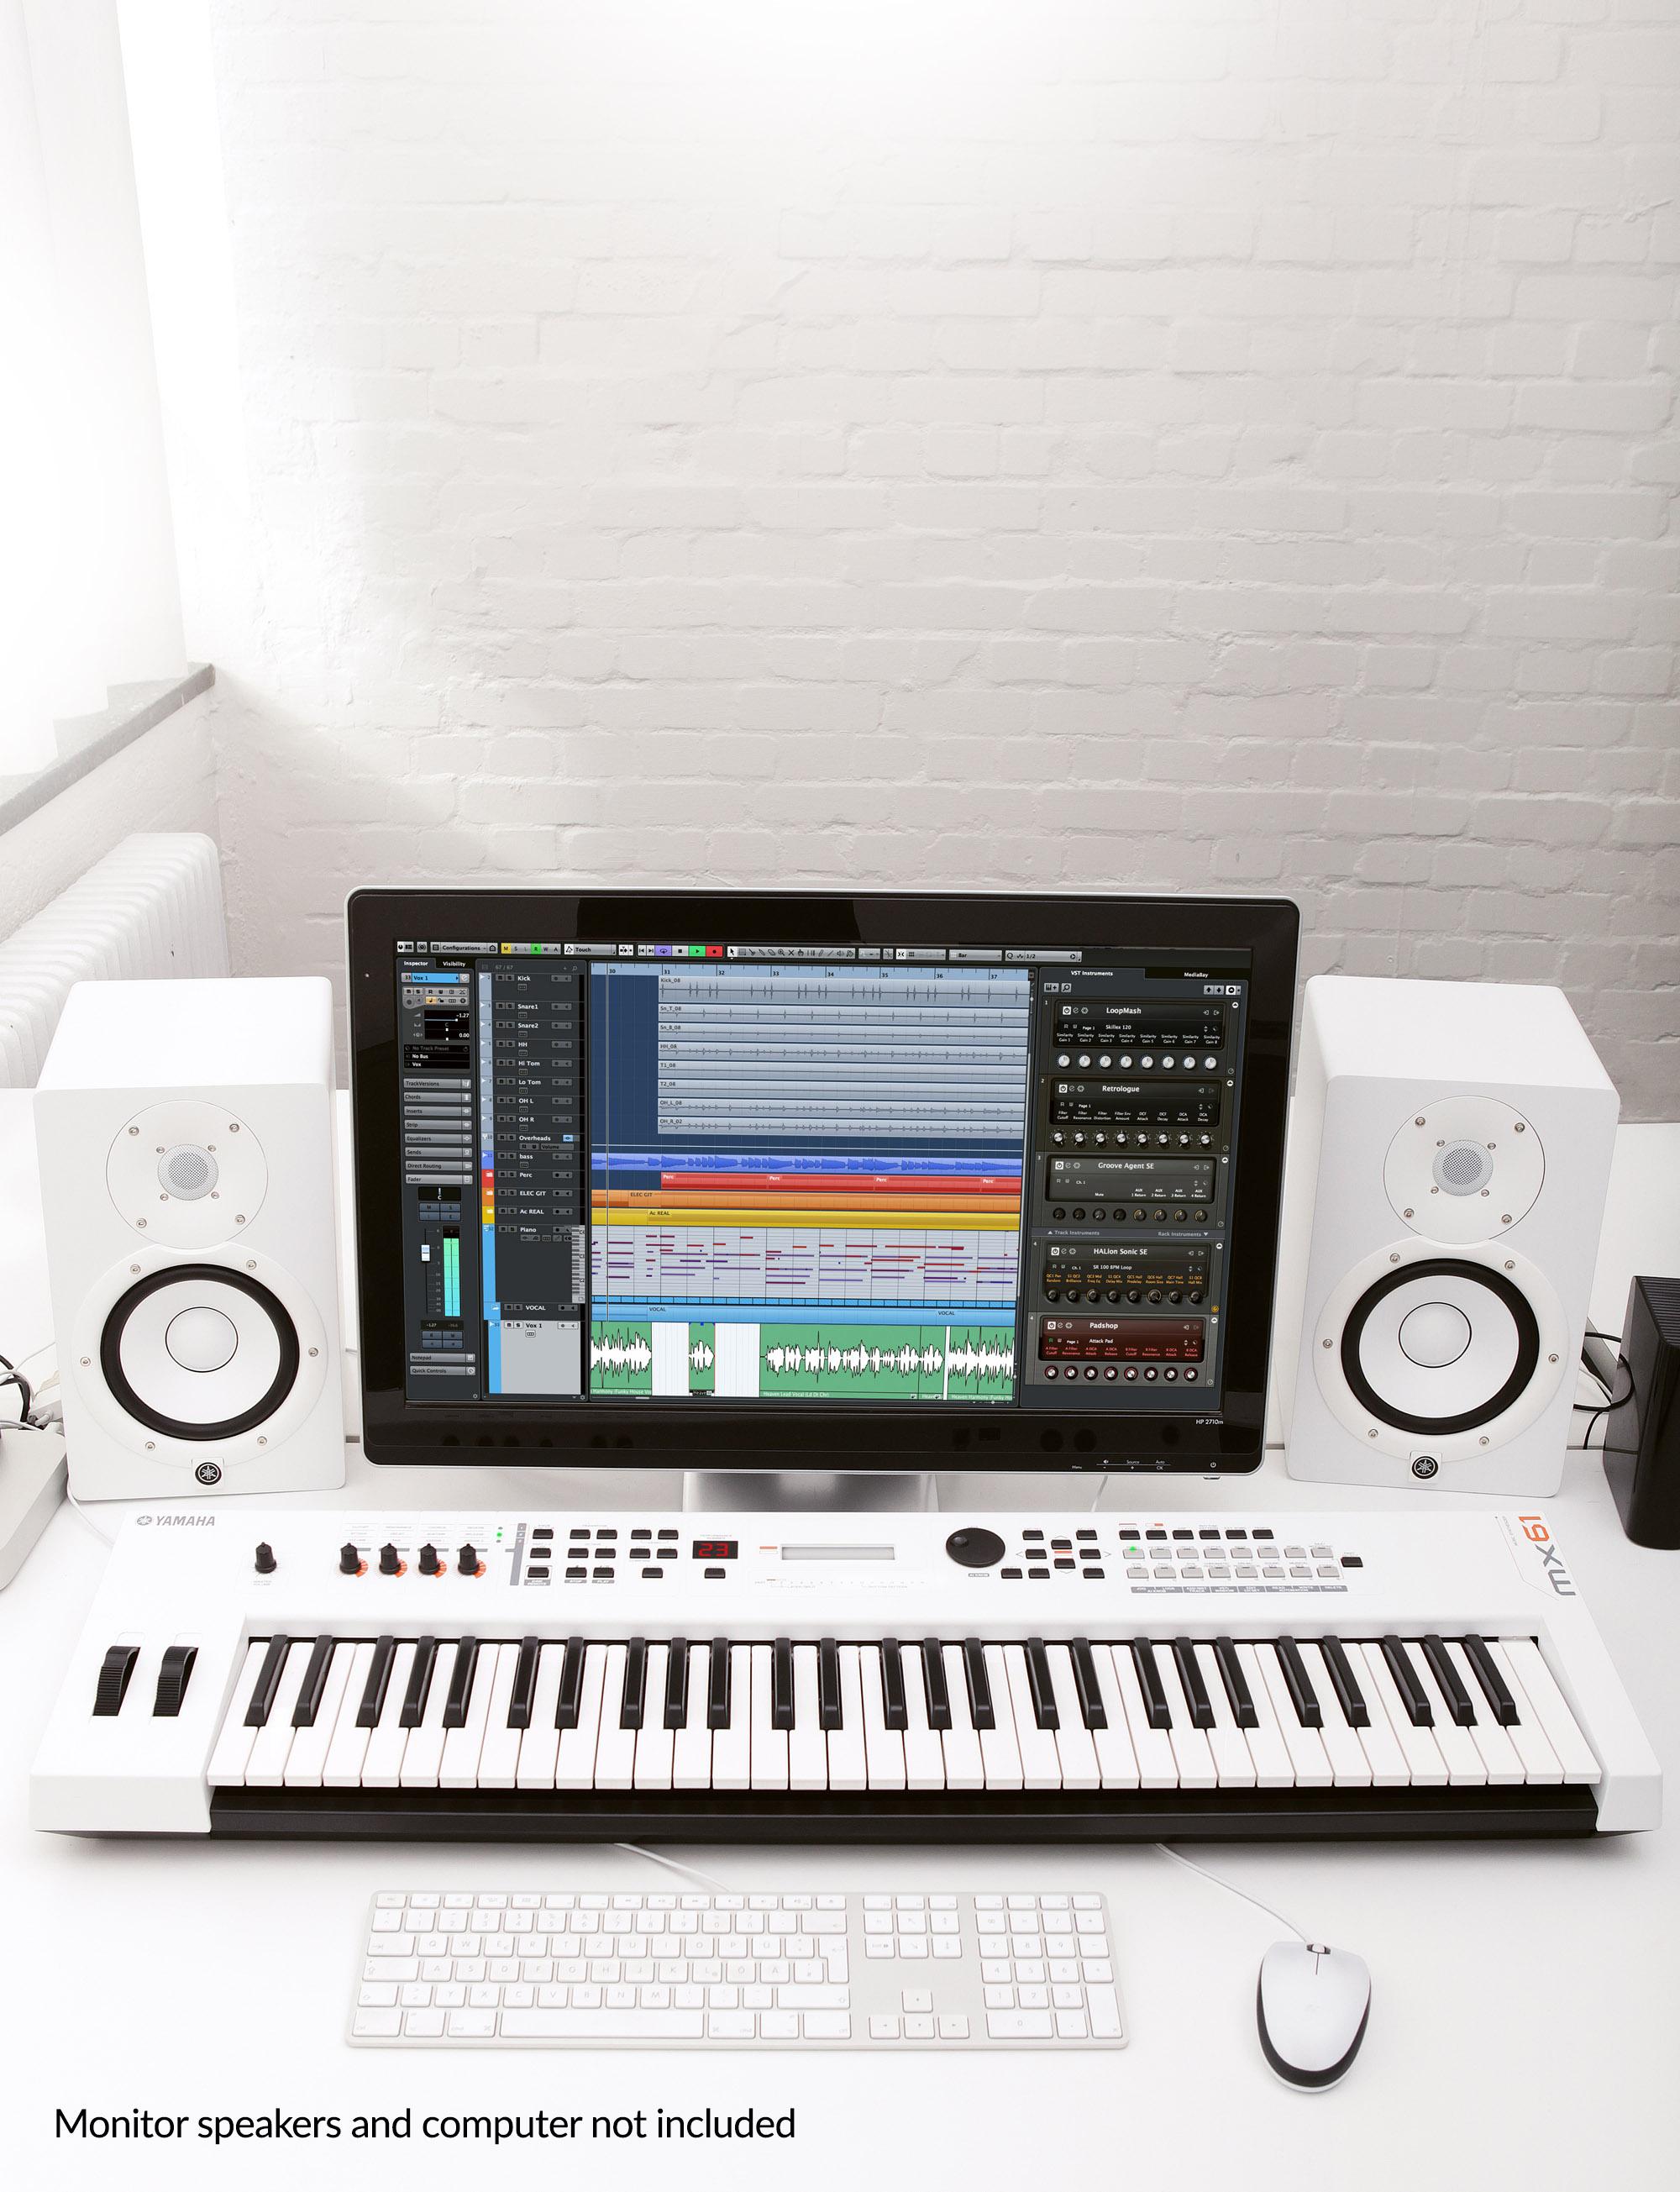 MX61 Version 2 Synthesizer 61 Key Edition, In White Finish